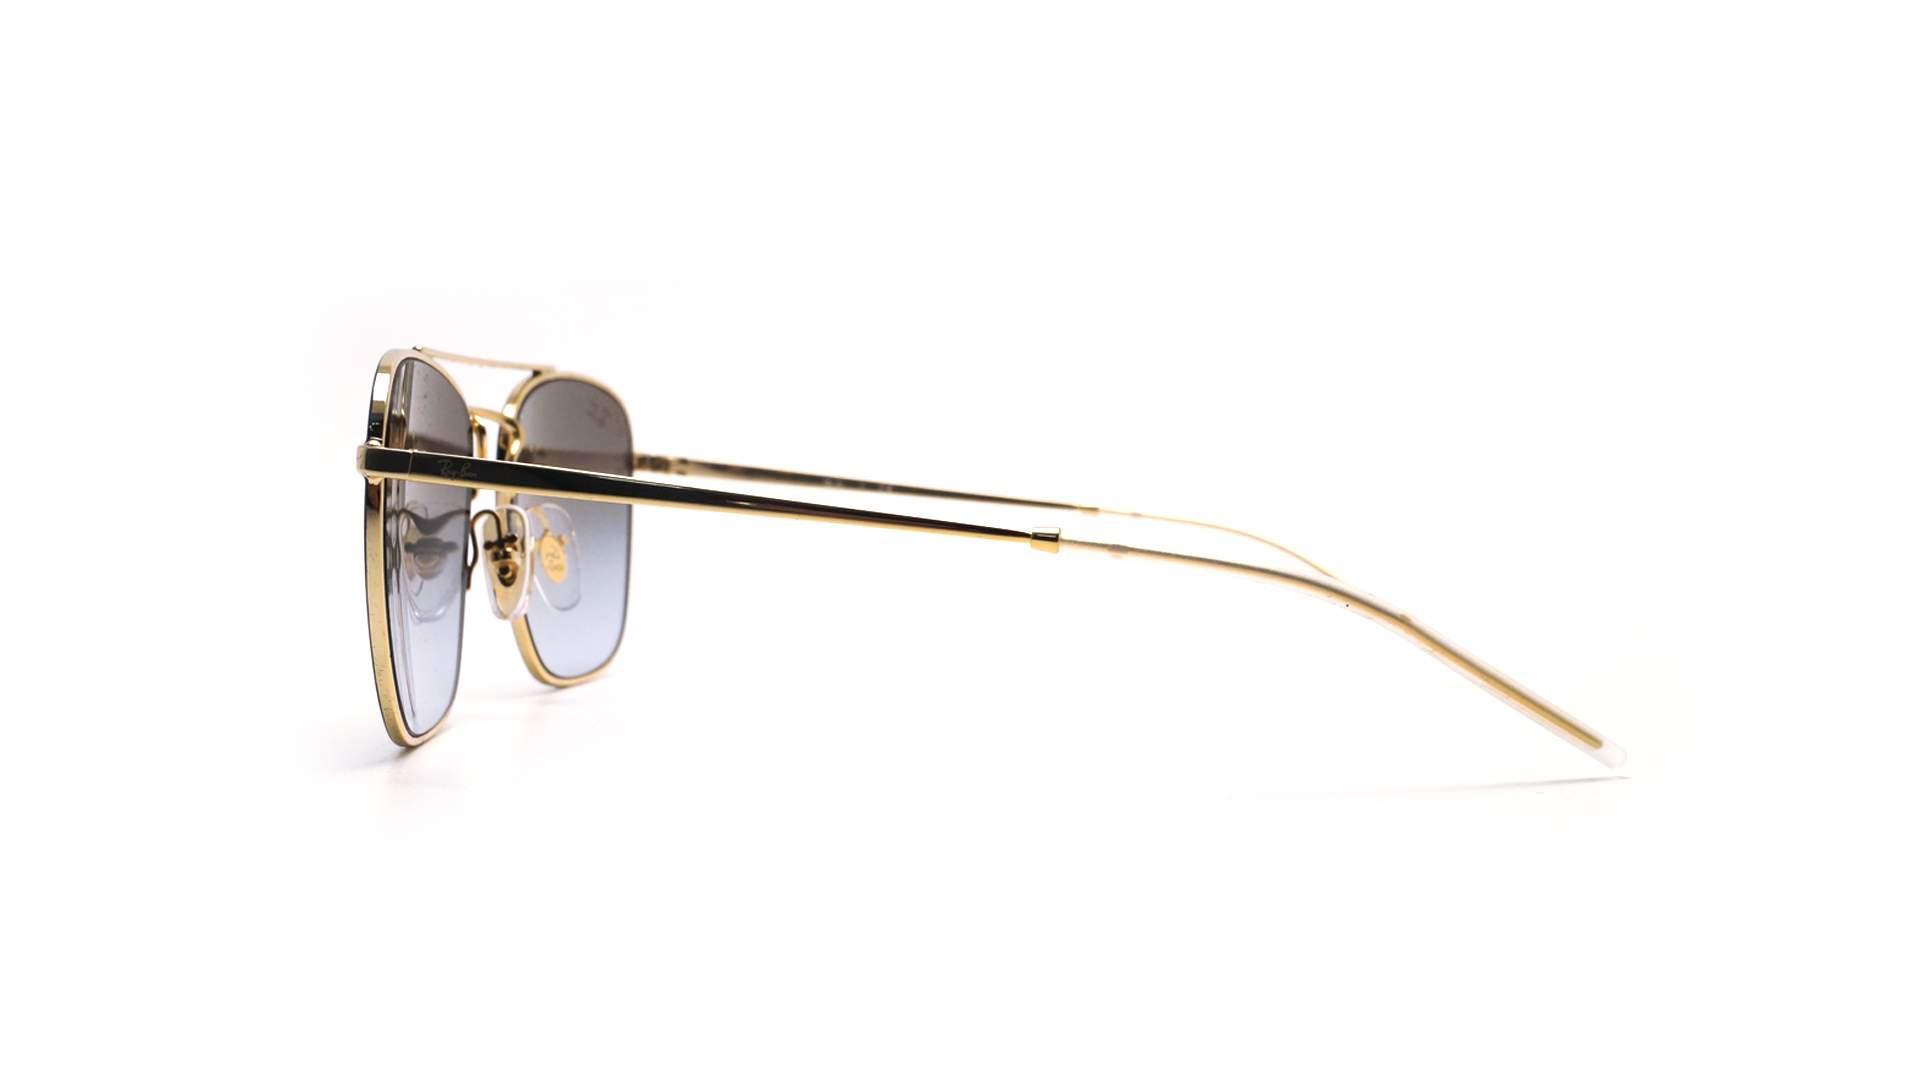 cb6fa2df5e5c4 Sunglasses Ray-Ban RB3588 9062 I7 55-19 Blue Medium Gradient